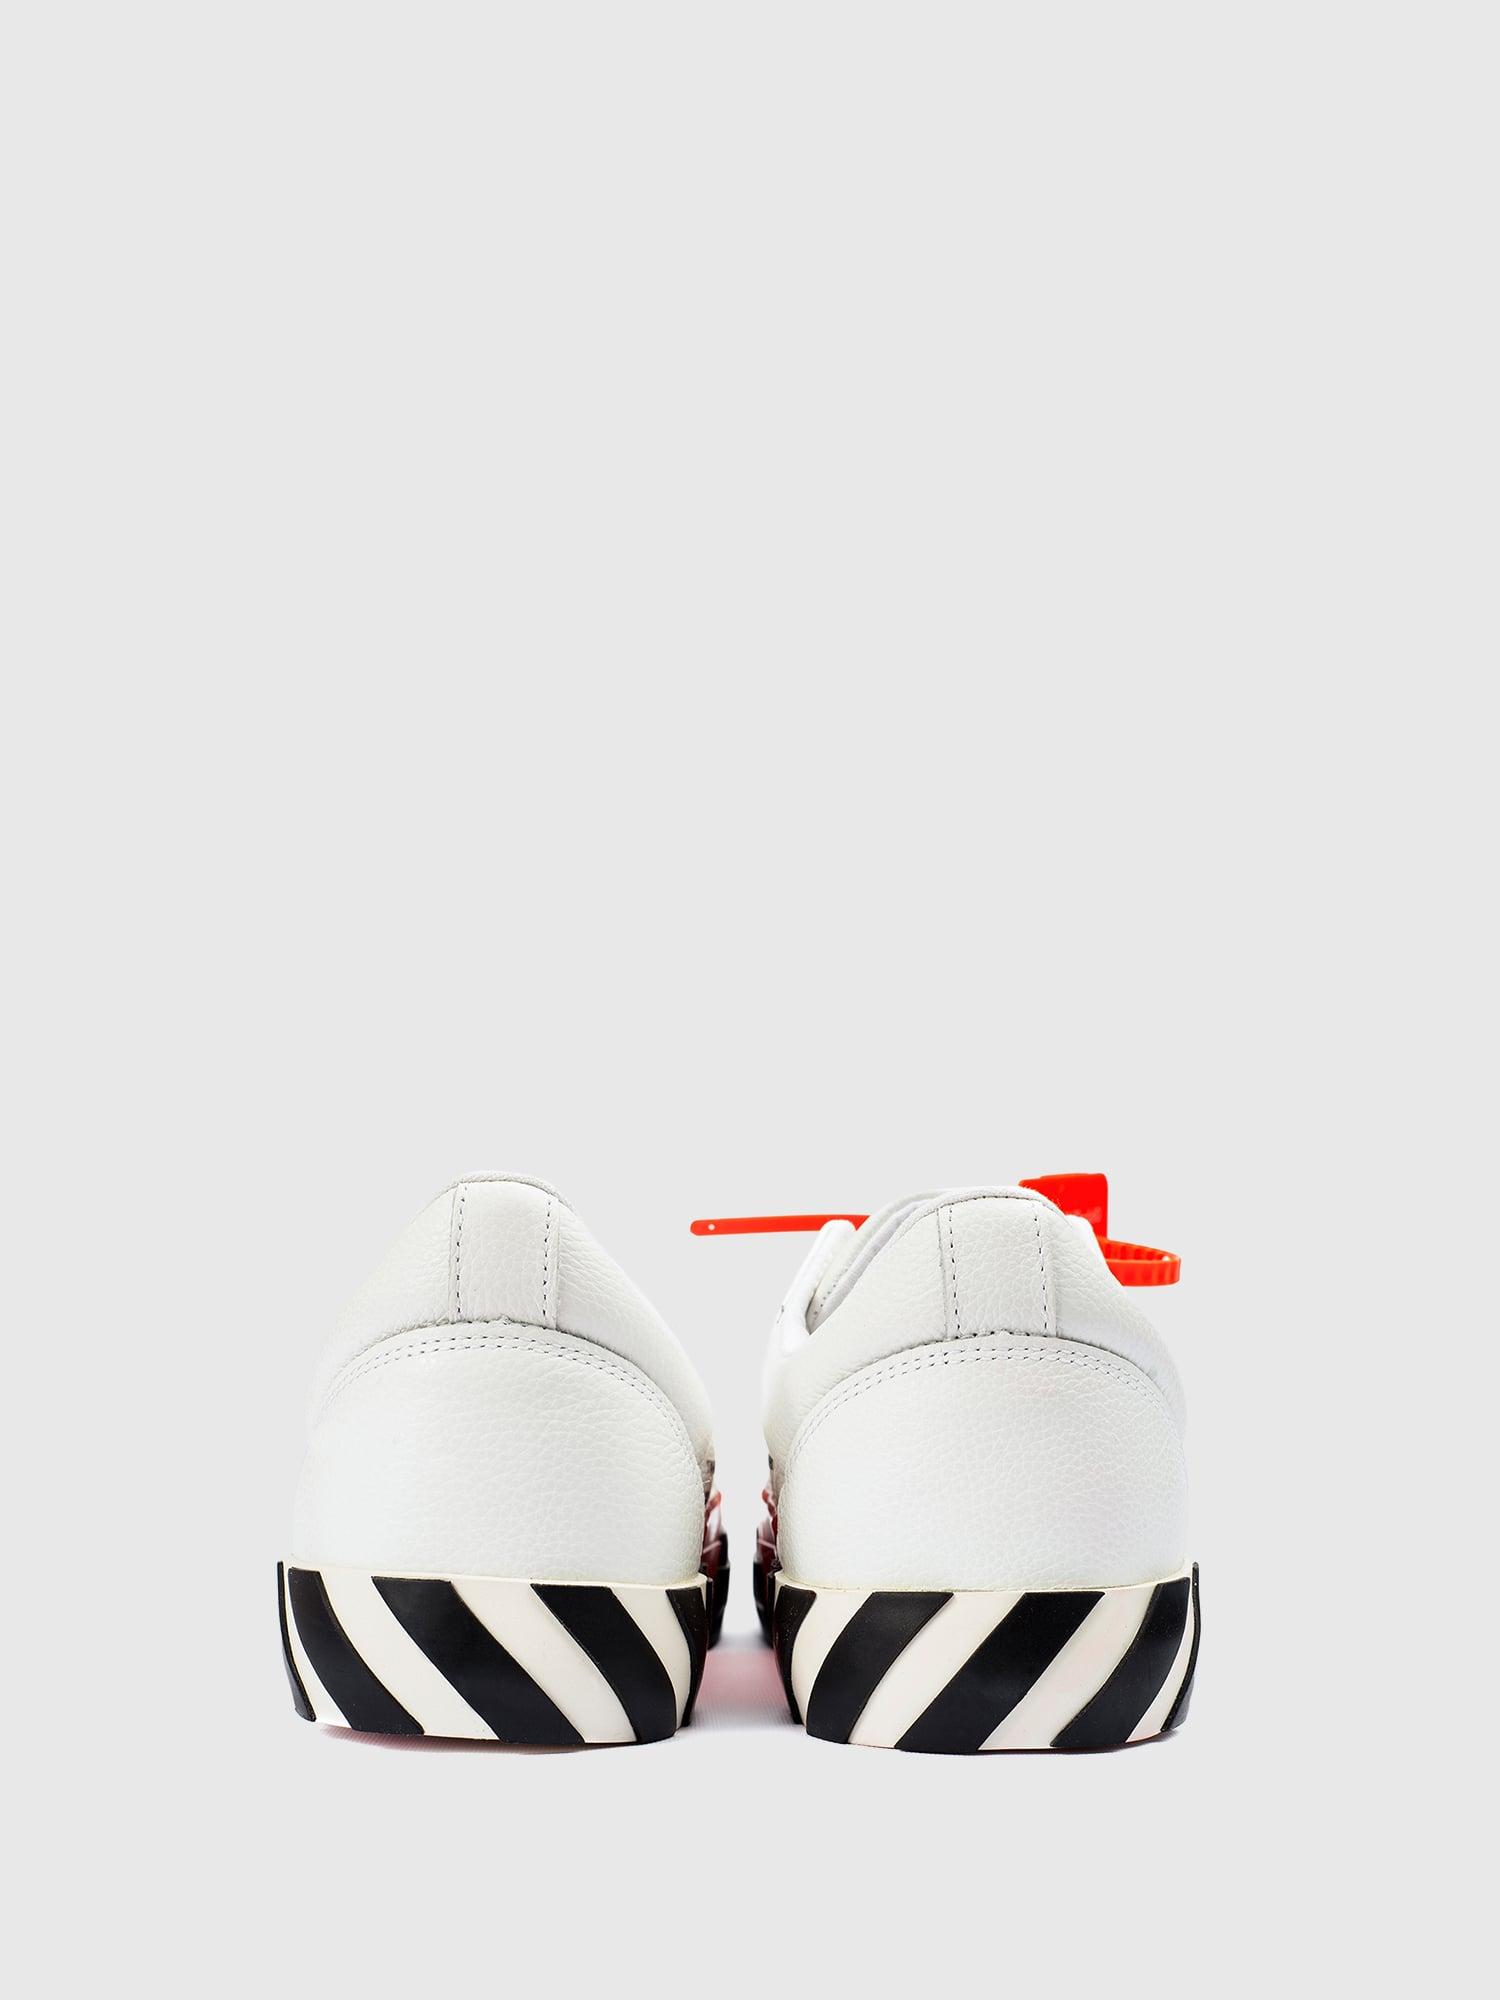 Off-White Vulc Sneaker 'White Black' 2020